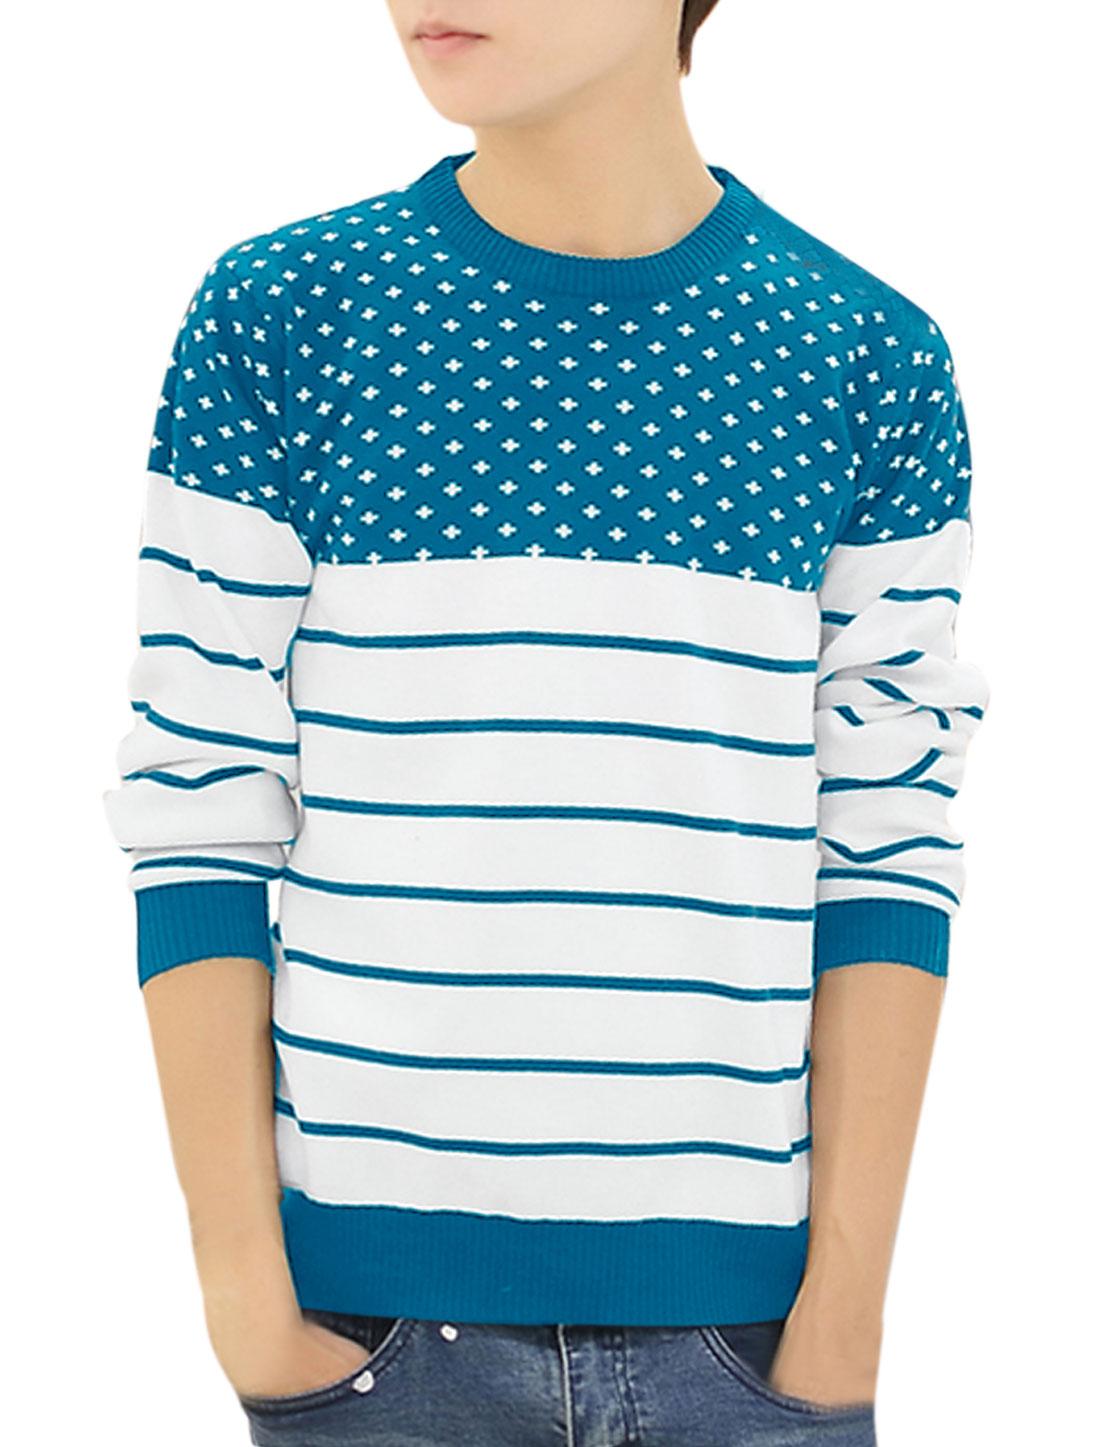 Men Crew Neck Cross Stripes Pattern Ribbing Trim Leisure Sweater Cyan M